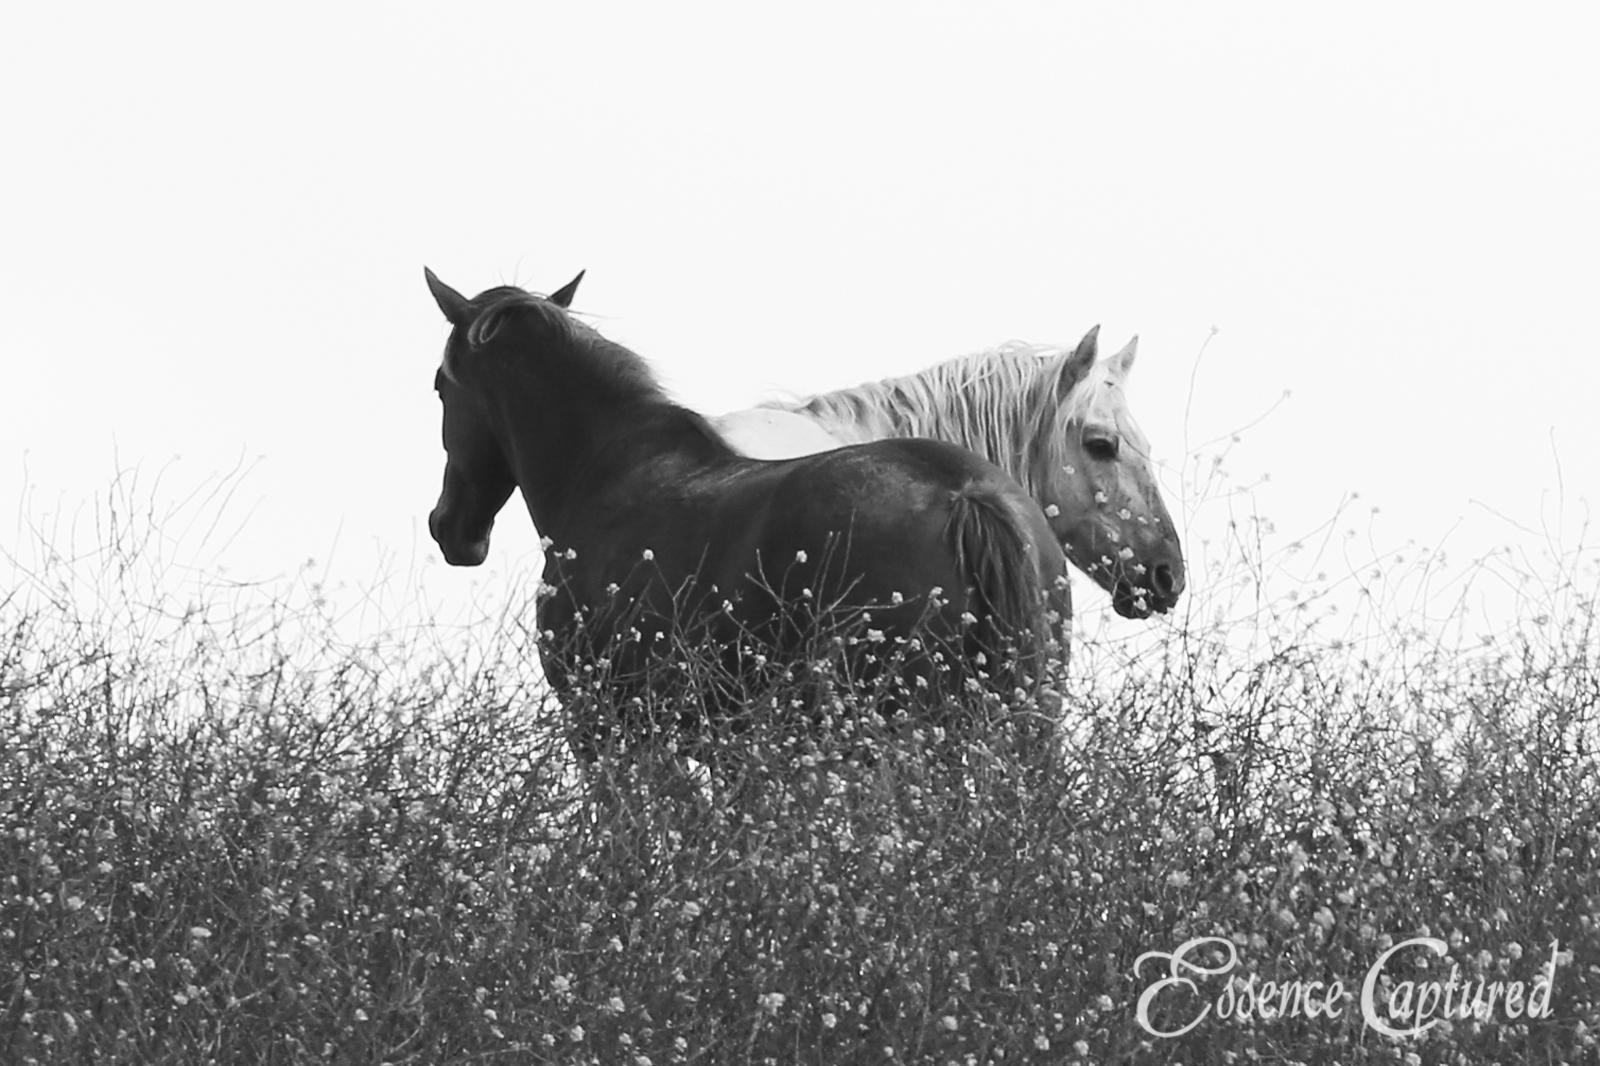 January 2020 Mustang Image